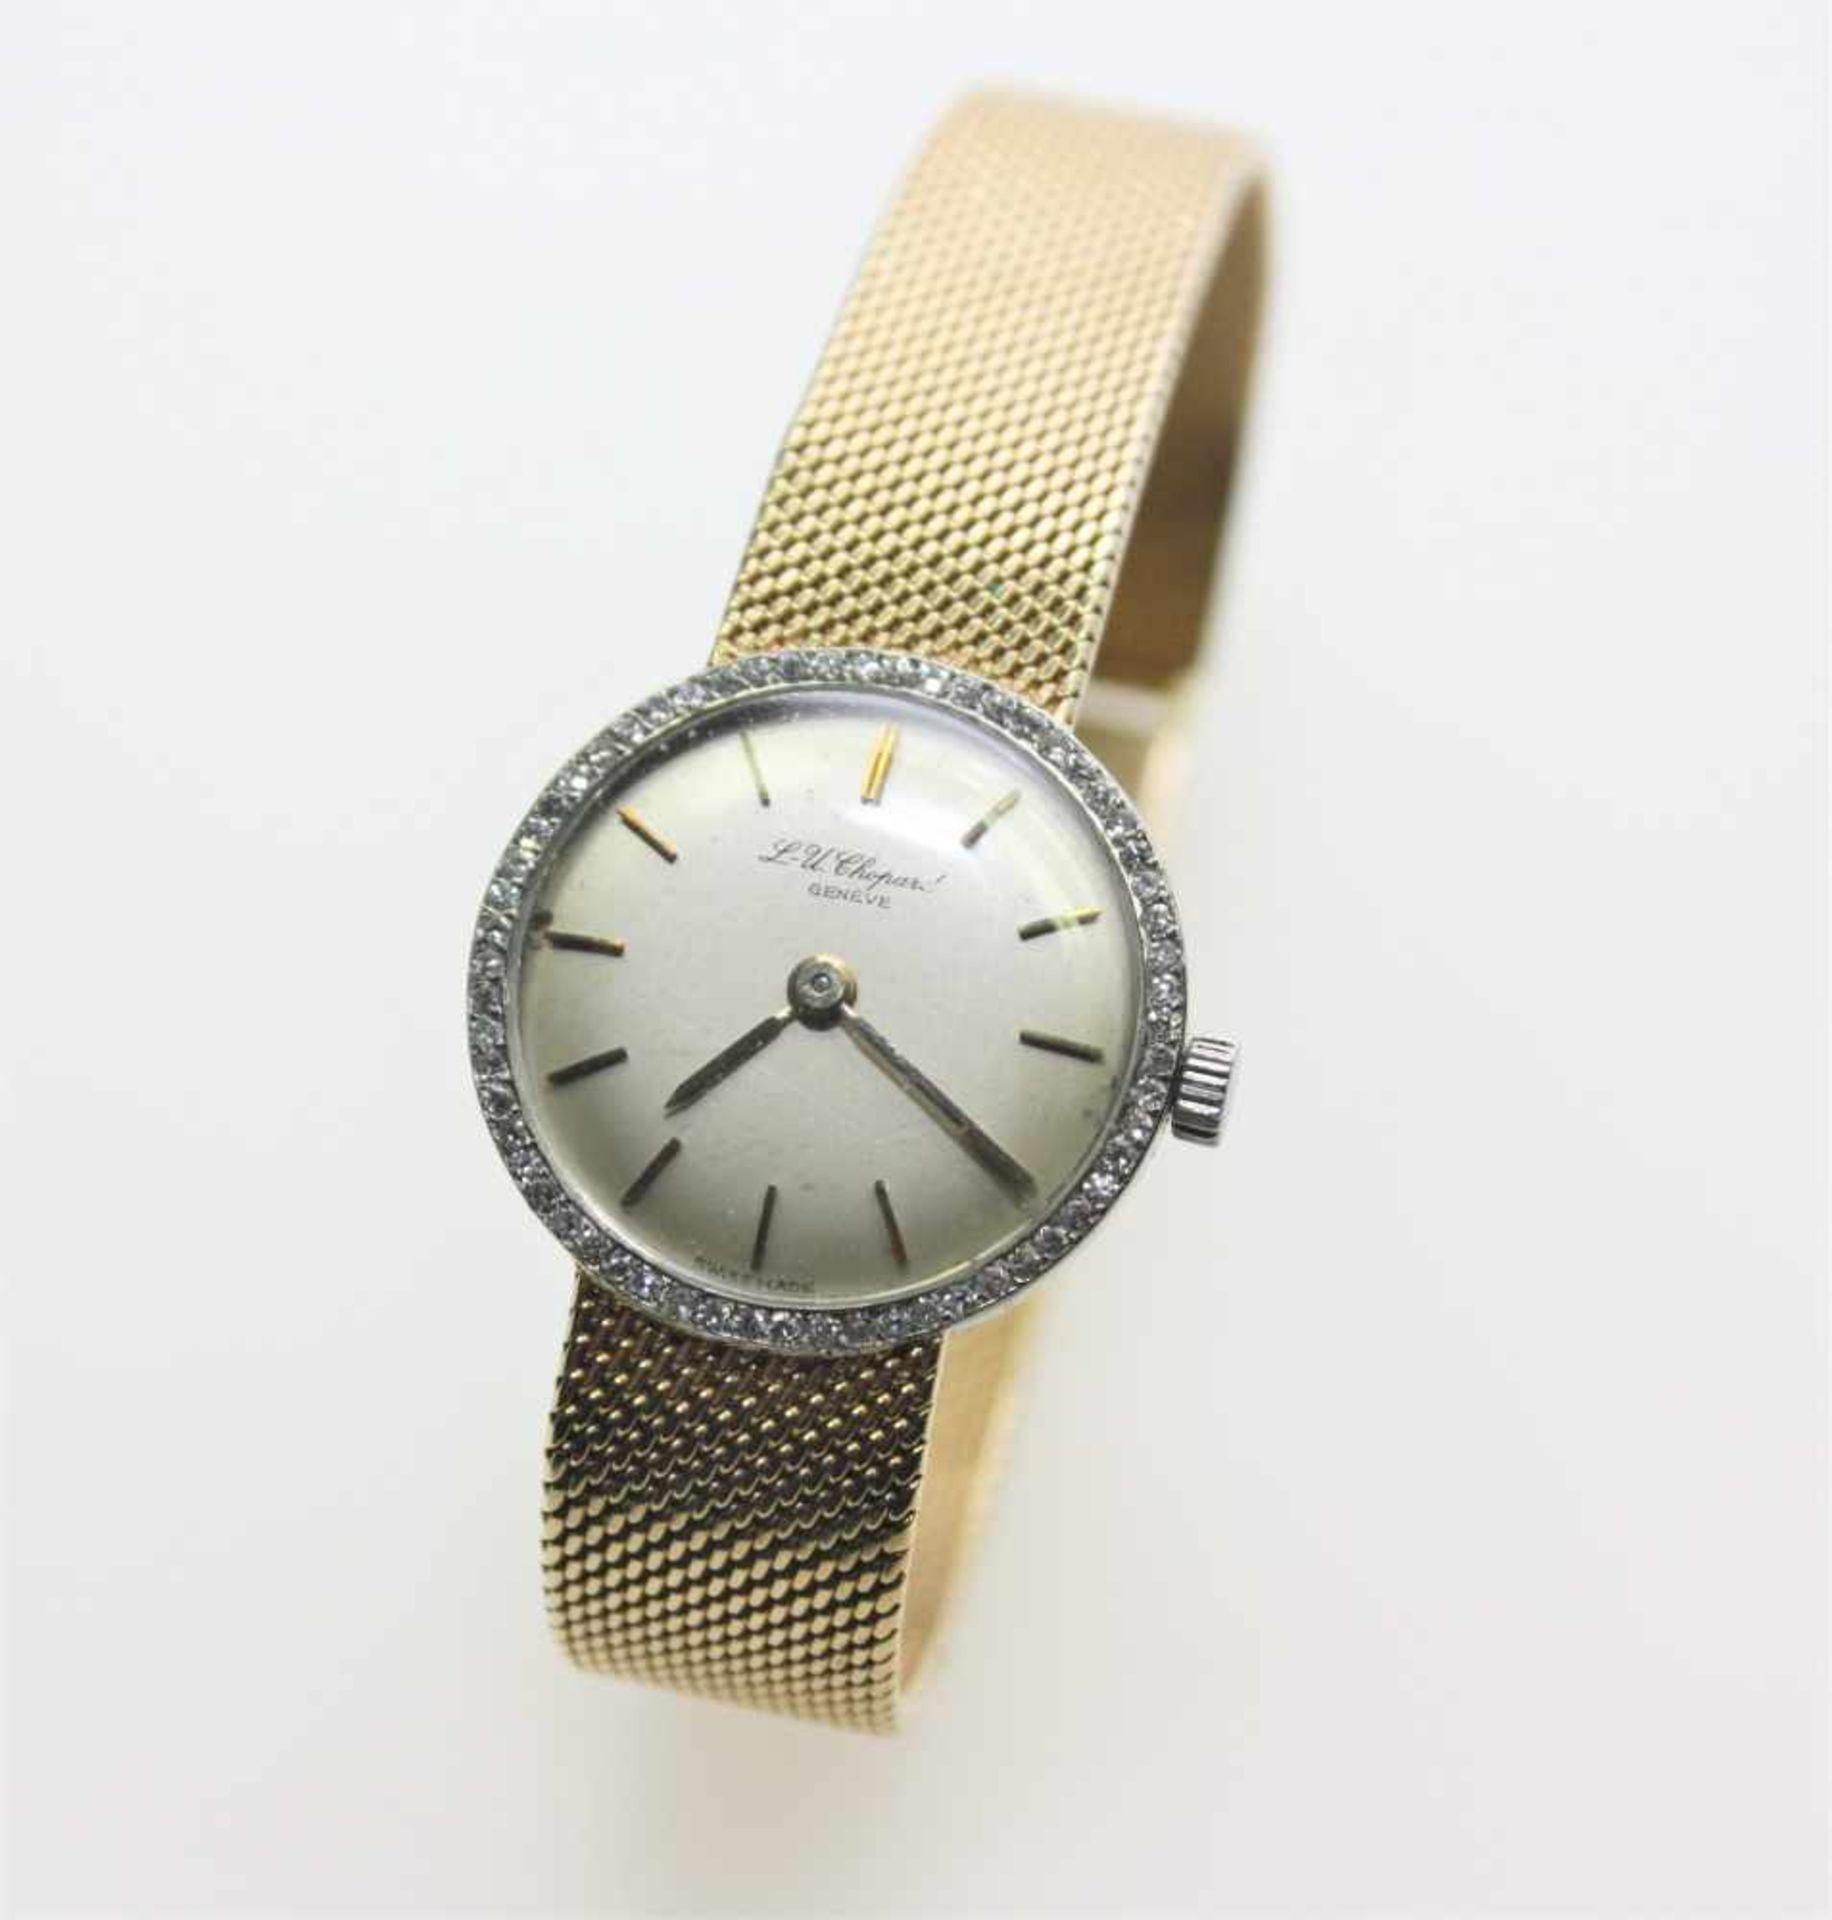 Los 25 - Ältere, goldene Damen-Armbanduhr mit fest angearbeitetem Ansatzband 750/f gest., rundes